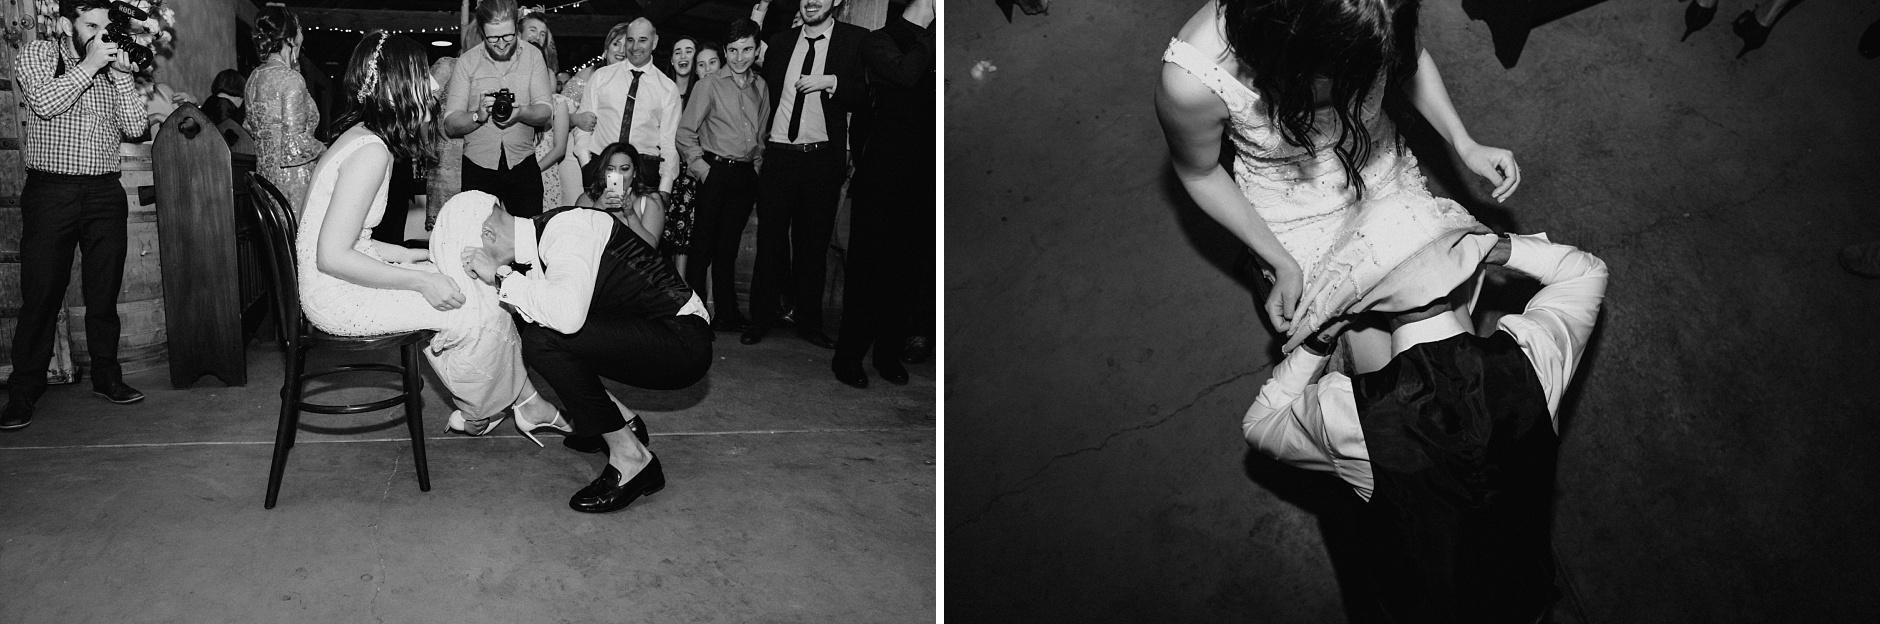 cassandra&cameron1361ab_Peppers-Creek-Wedding.jpg